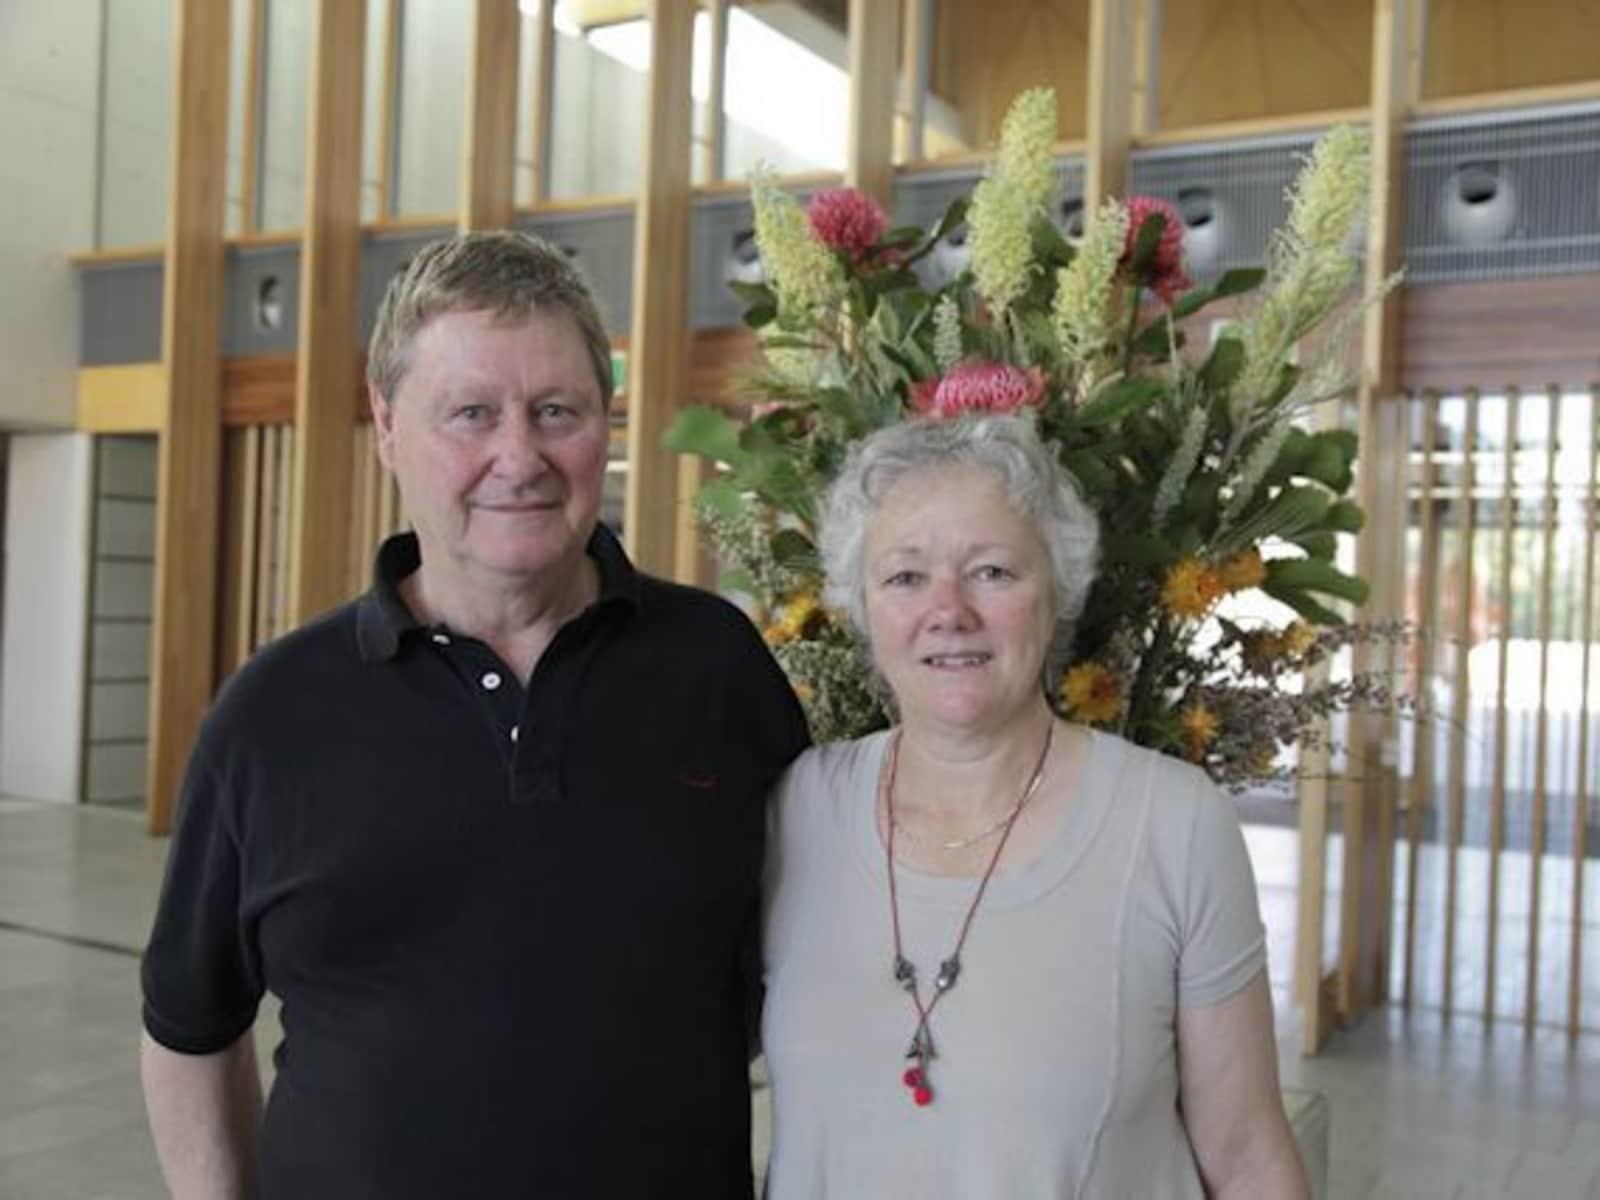 Tony & Denise from Canberra, Australian Capital Territory, Australia